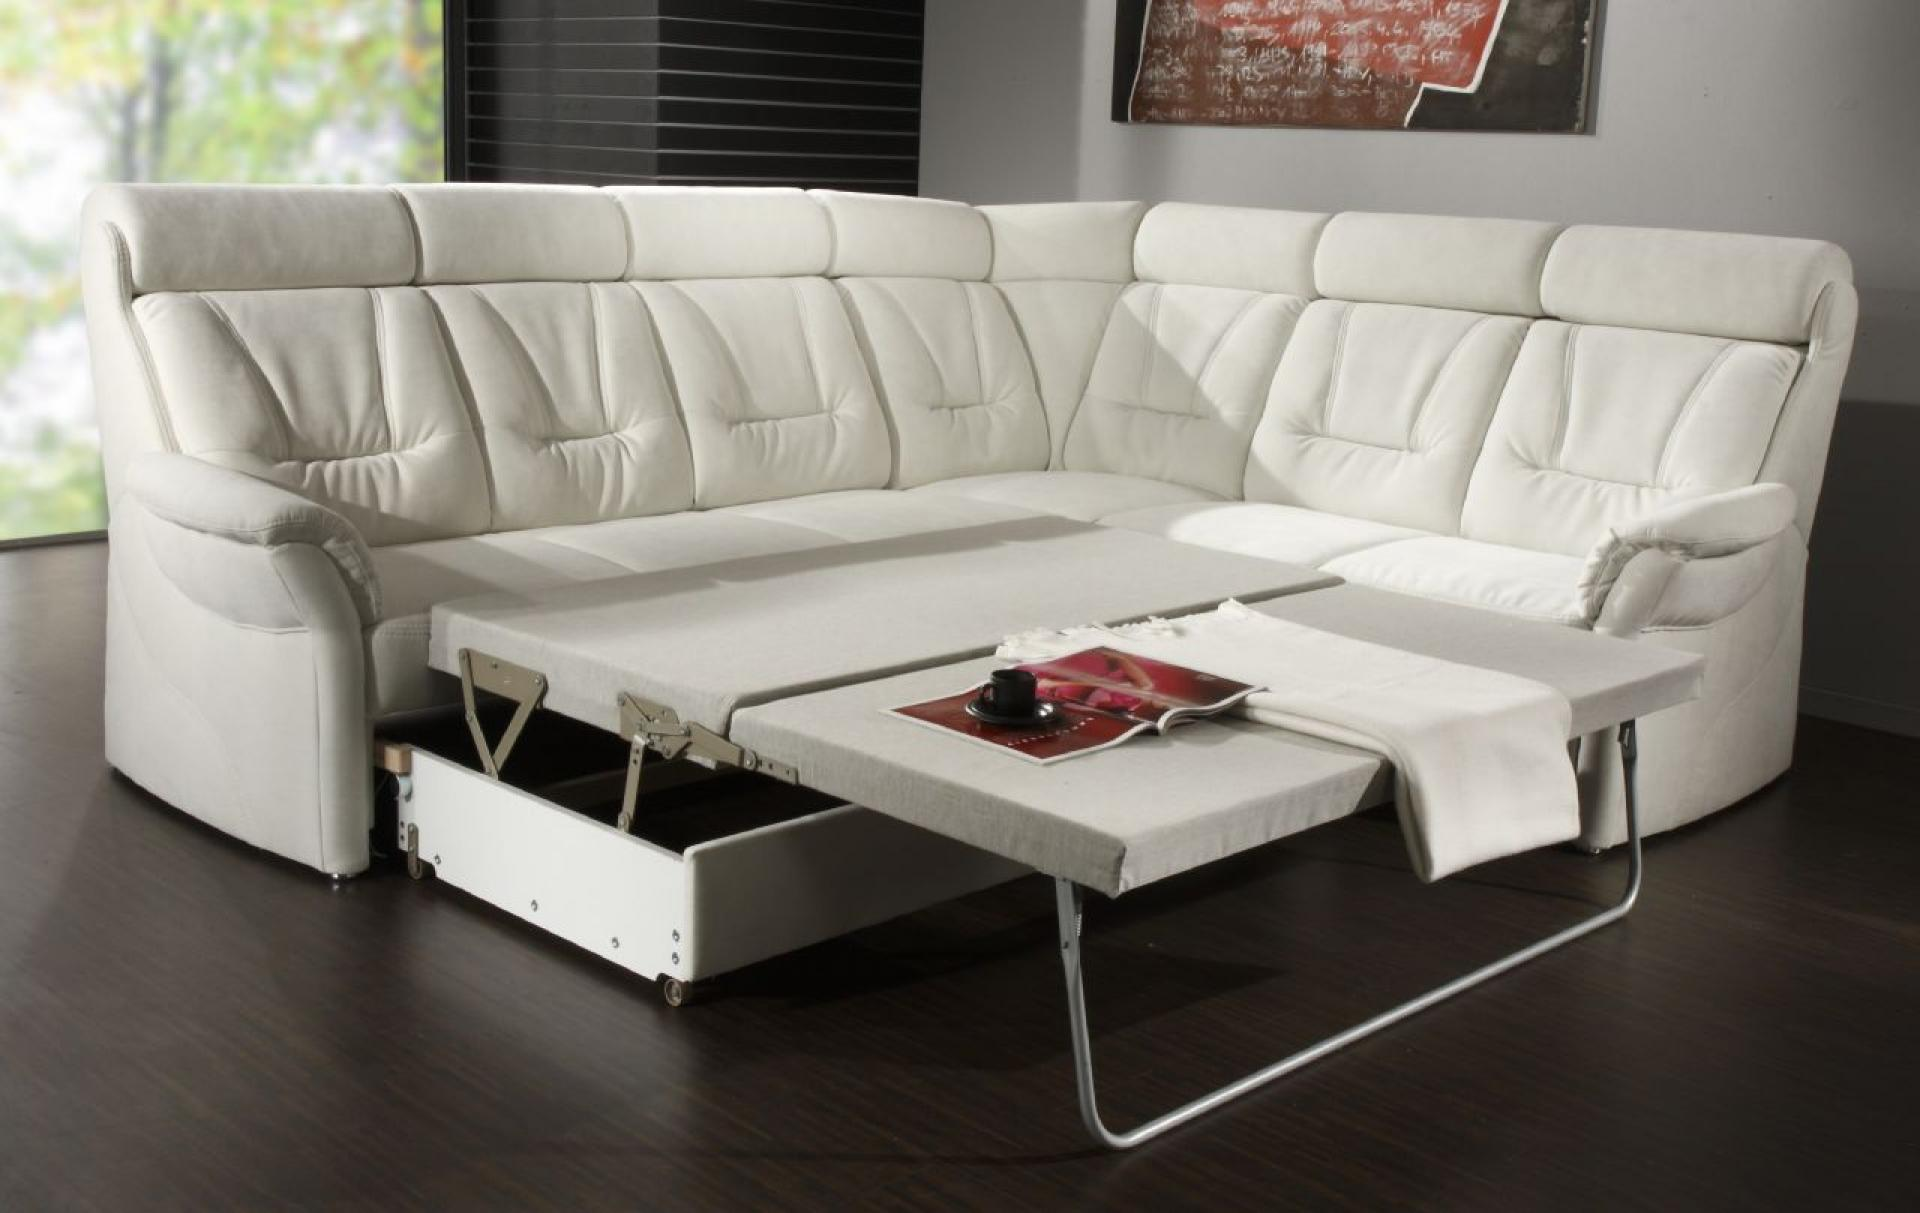 photos canap lit confortable ikea. Black Bedroom Furniture Sets. Home Design Ideas